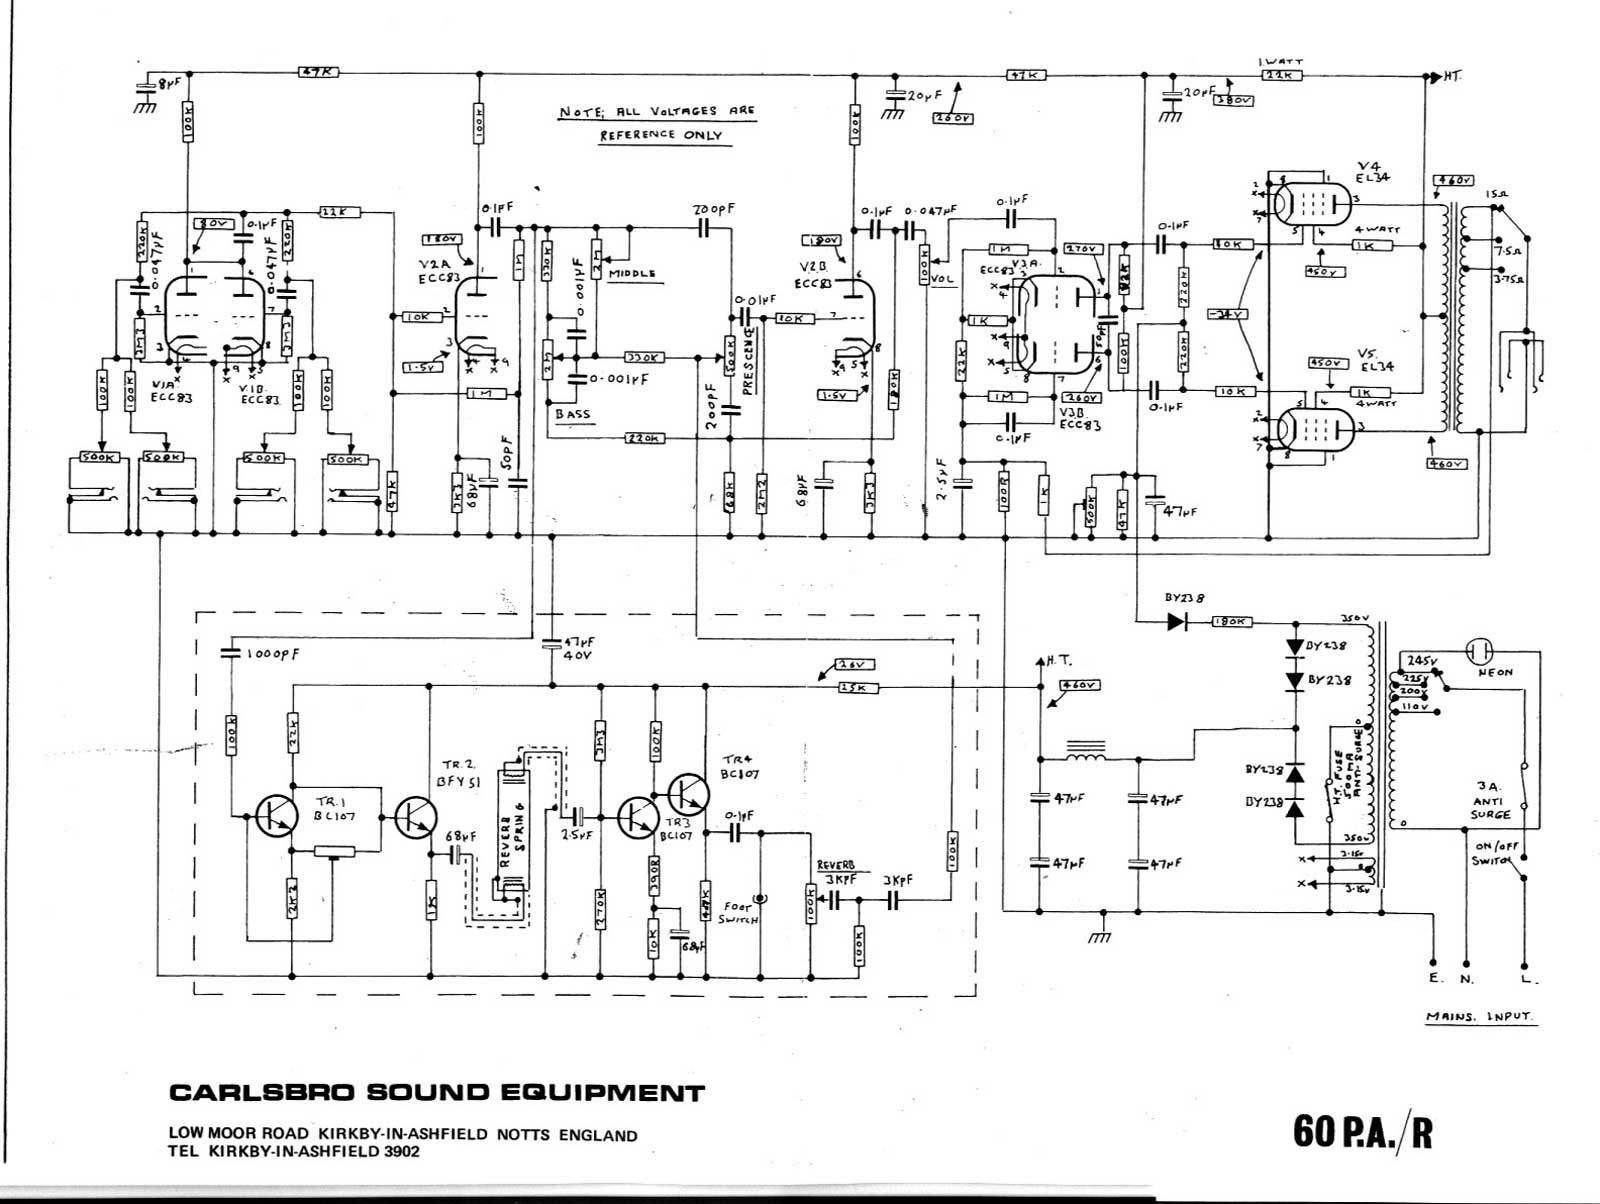 Peavey t 60 wiring diagram wiring diagram image guitar telstar wiring diagram refrence peavey t 60 wiring diagram unique blue guitar schematics cheapraybanclubmaster Images